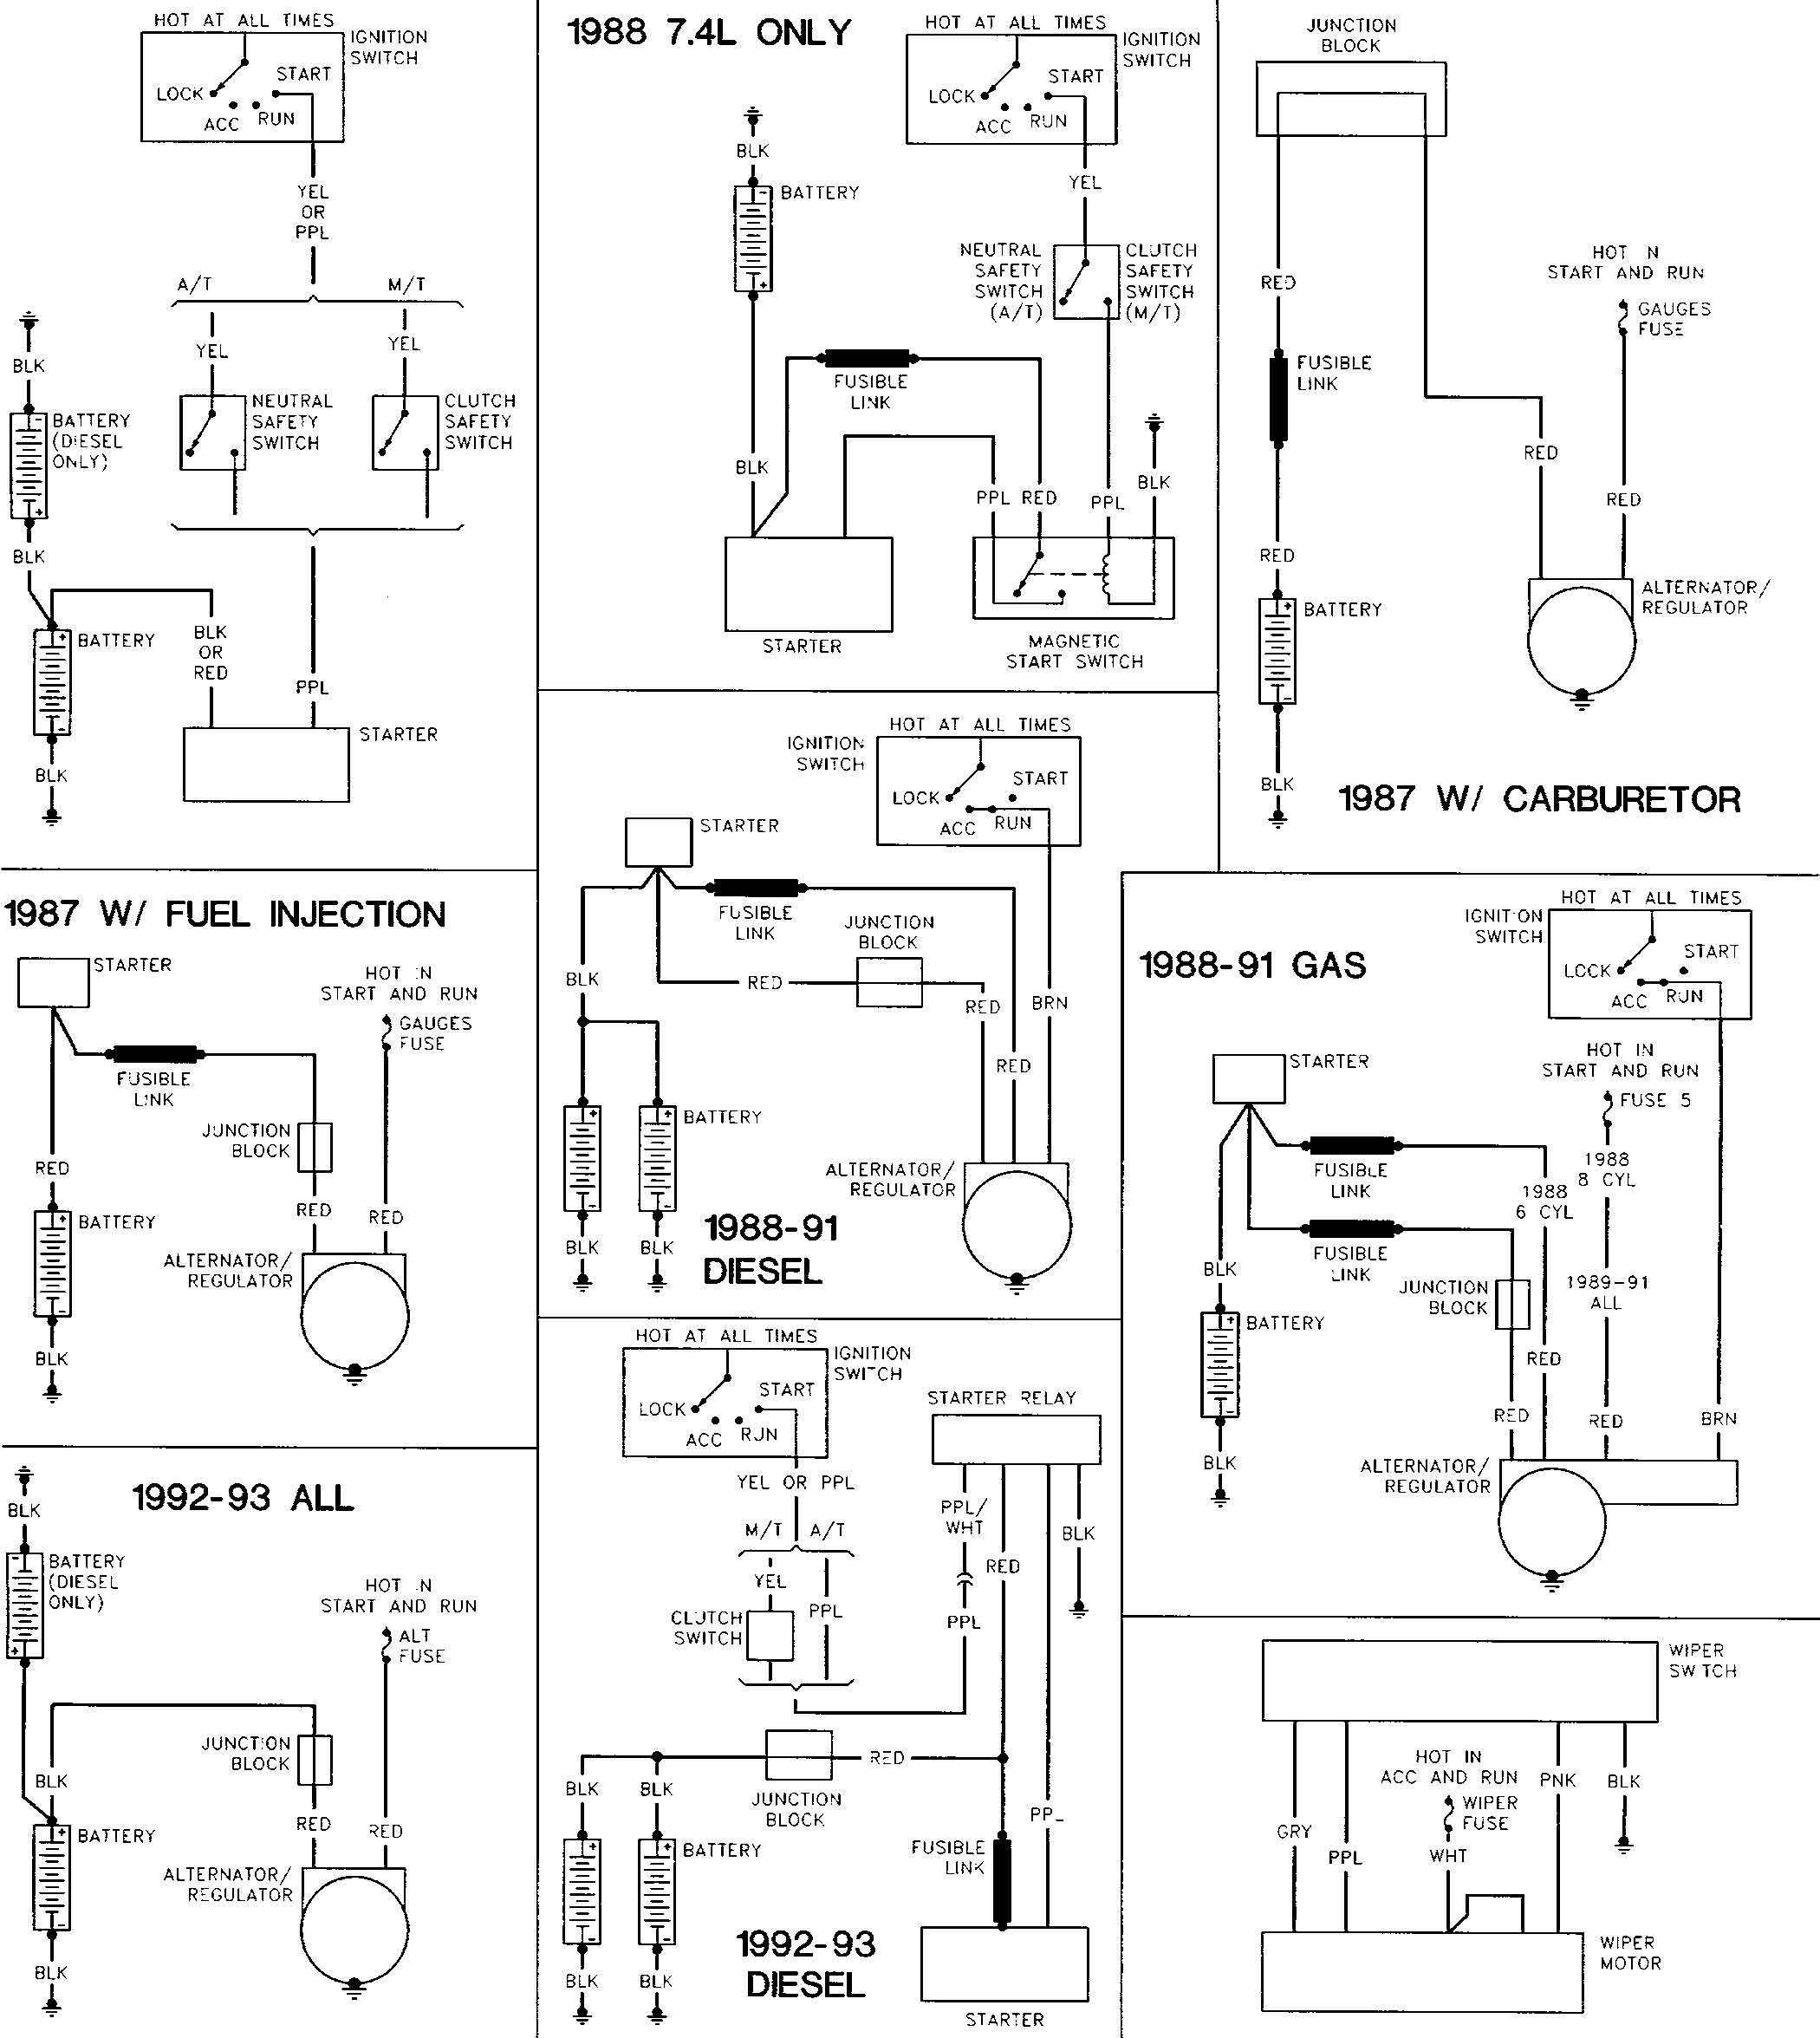 Tiffin Motorhome Wiring Diagram 16 23 Kenmo Lp De